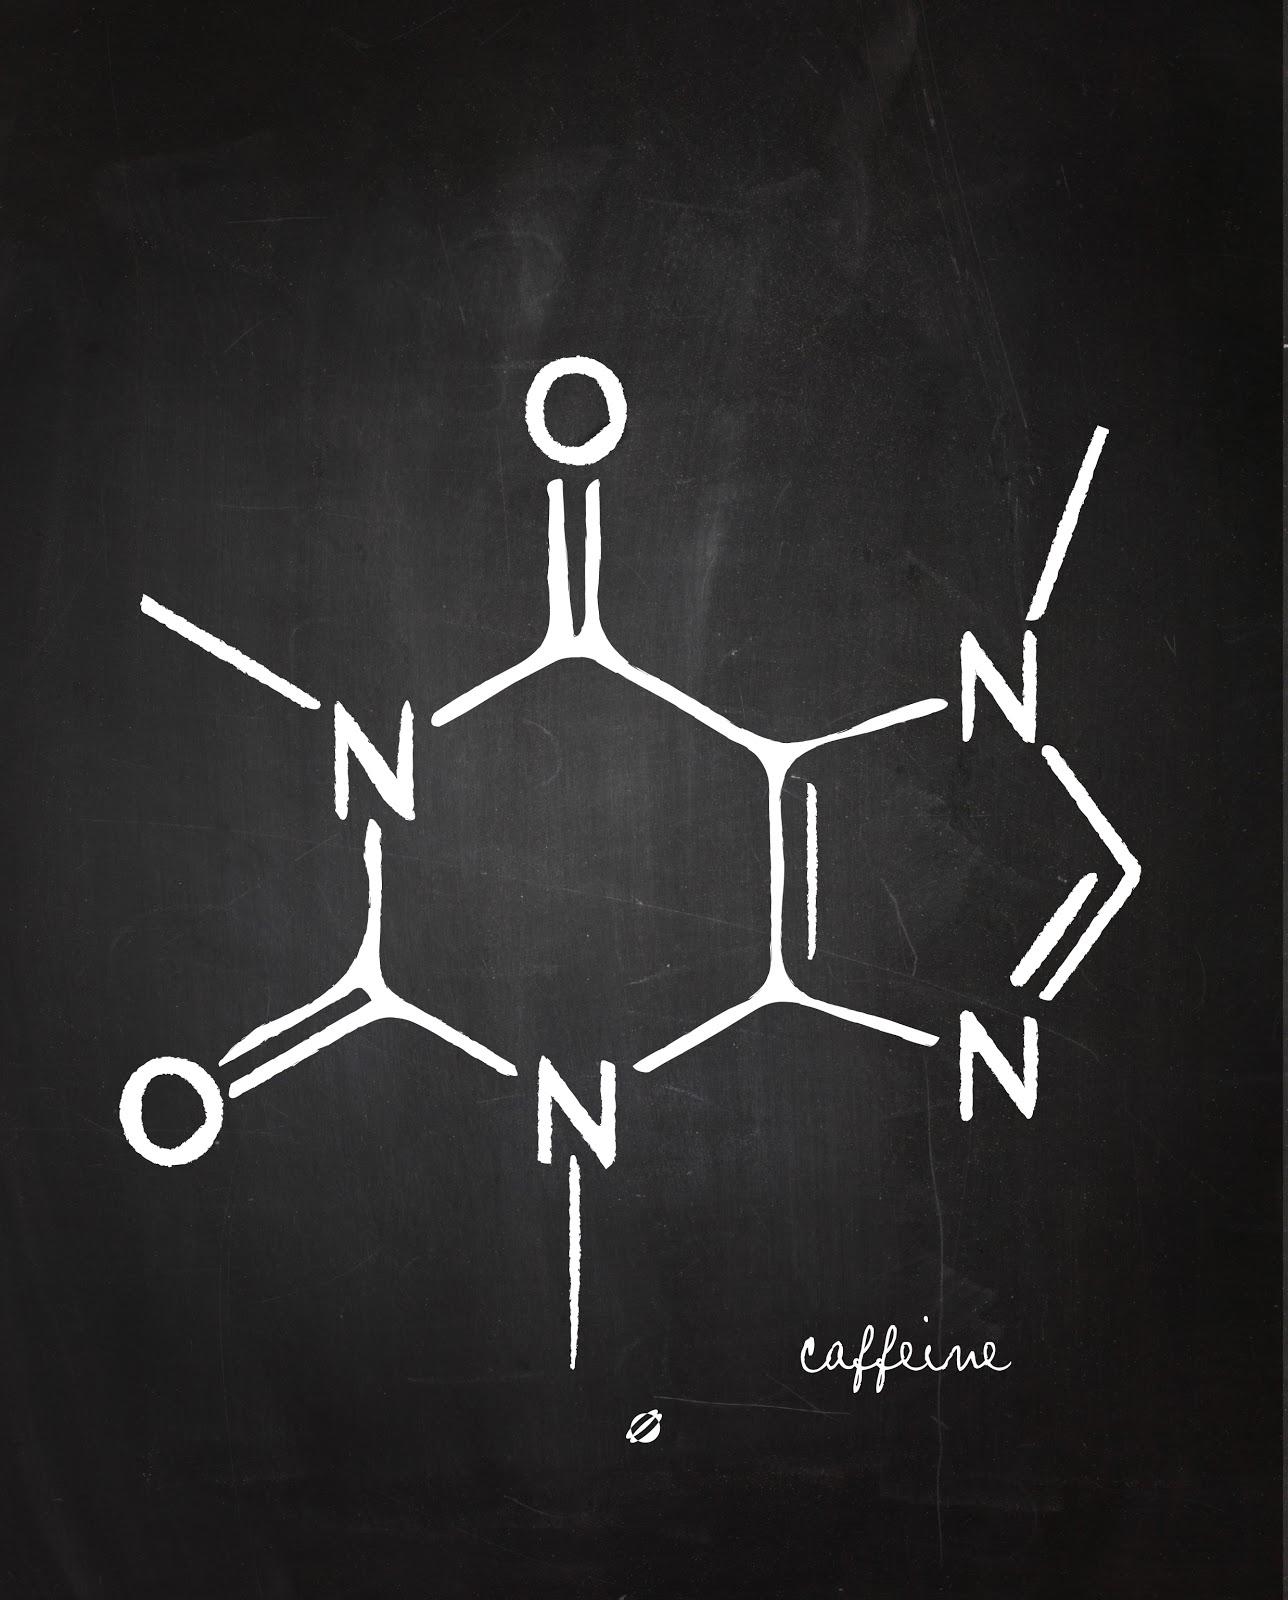 LostBumblebee ©2014 Caffeine Chemistry 101 FREE PRINTABLE